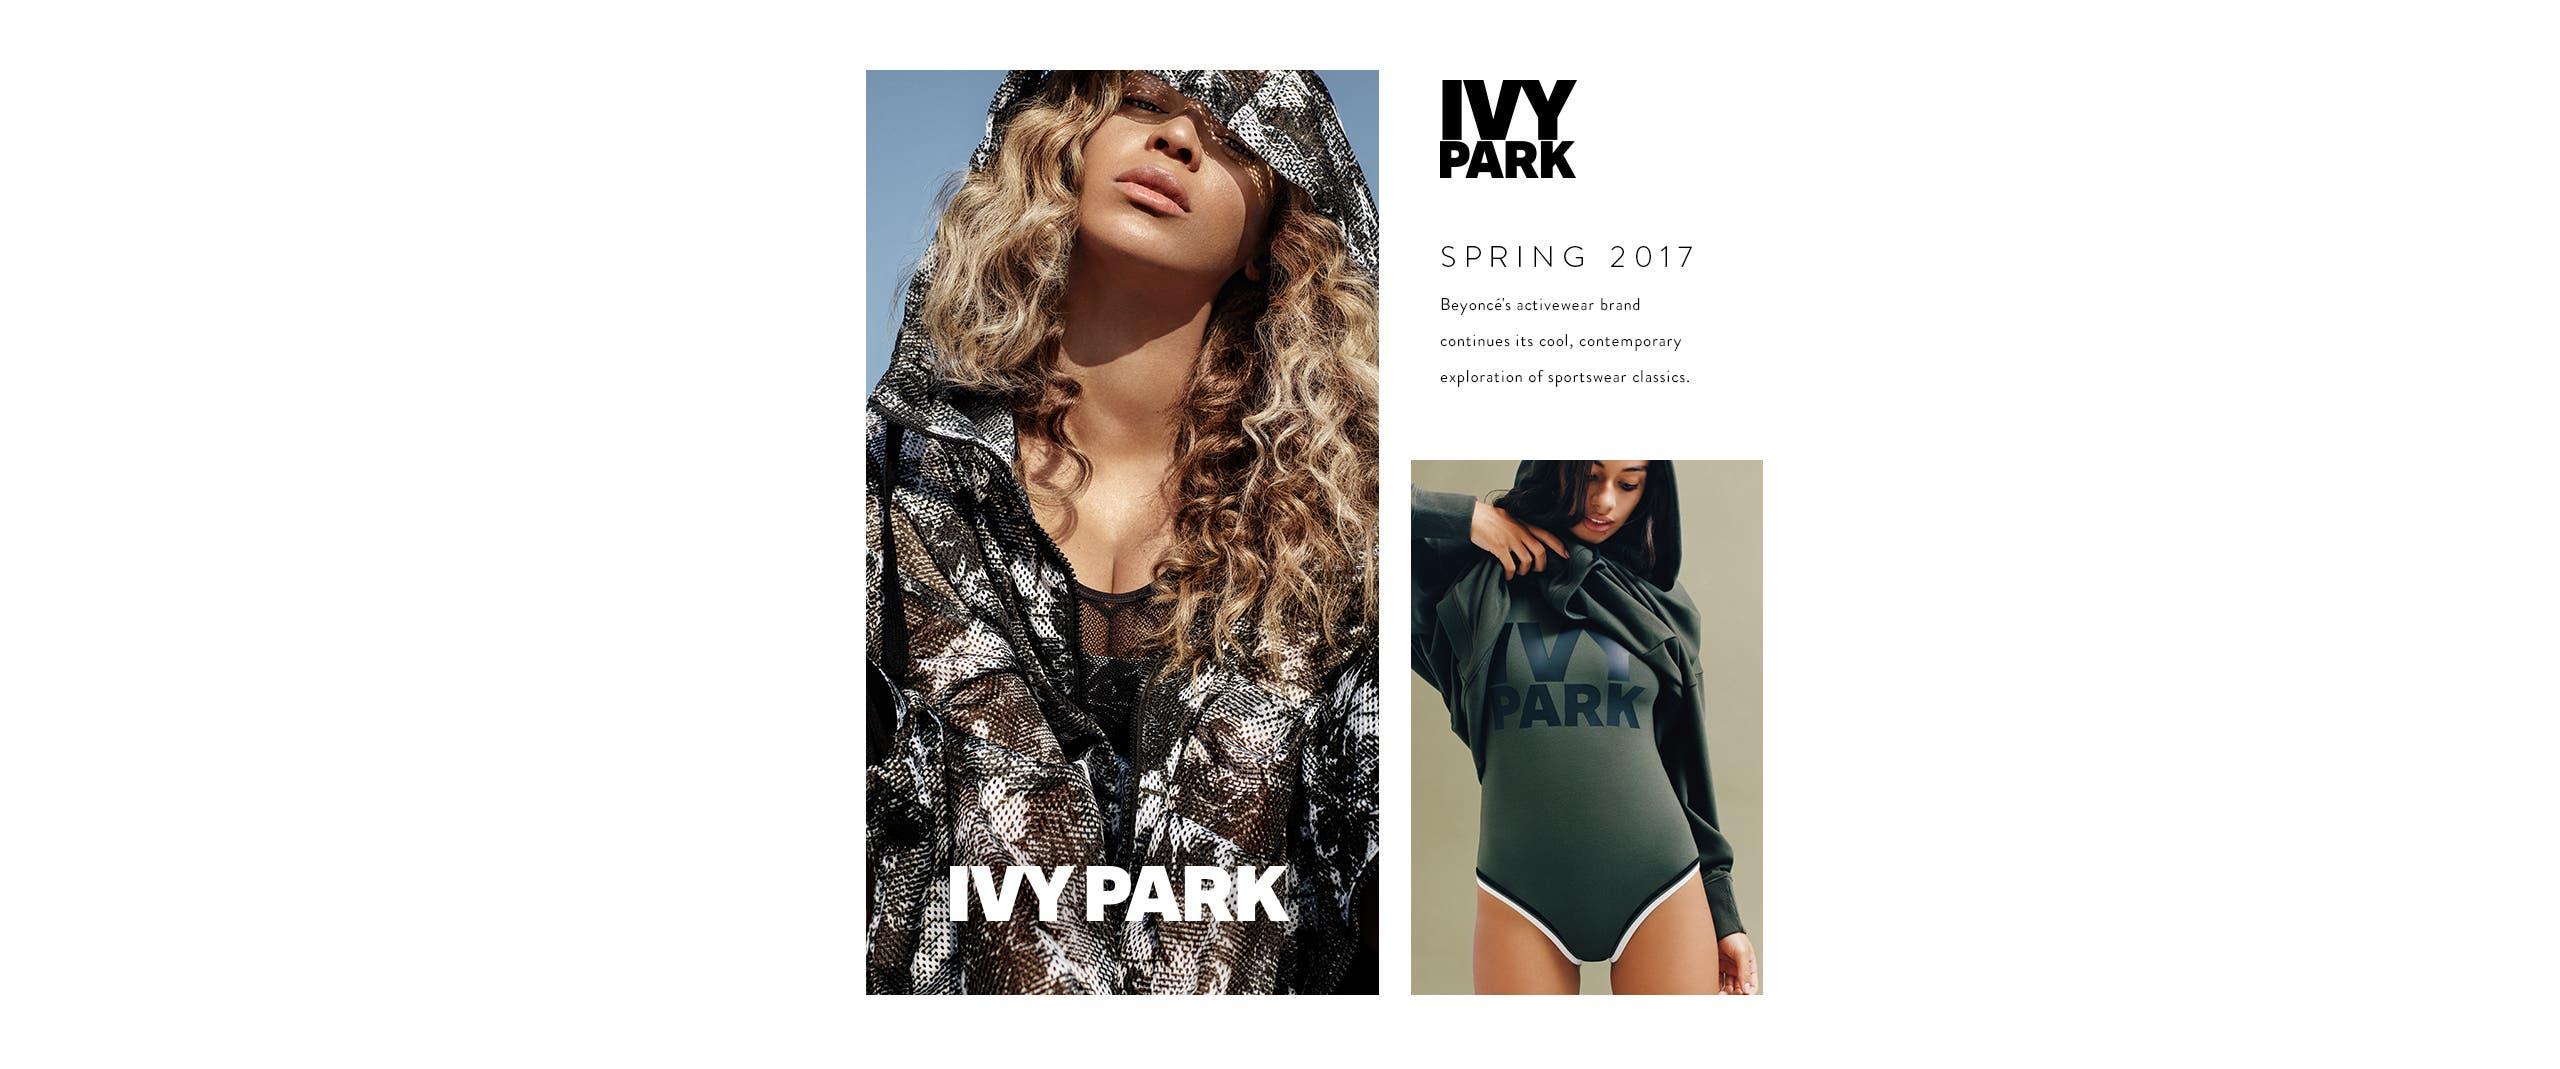 Spring 2017: IVY PARK women's activewear.